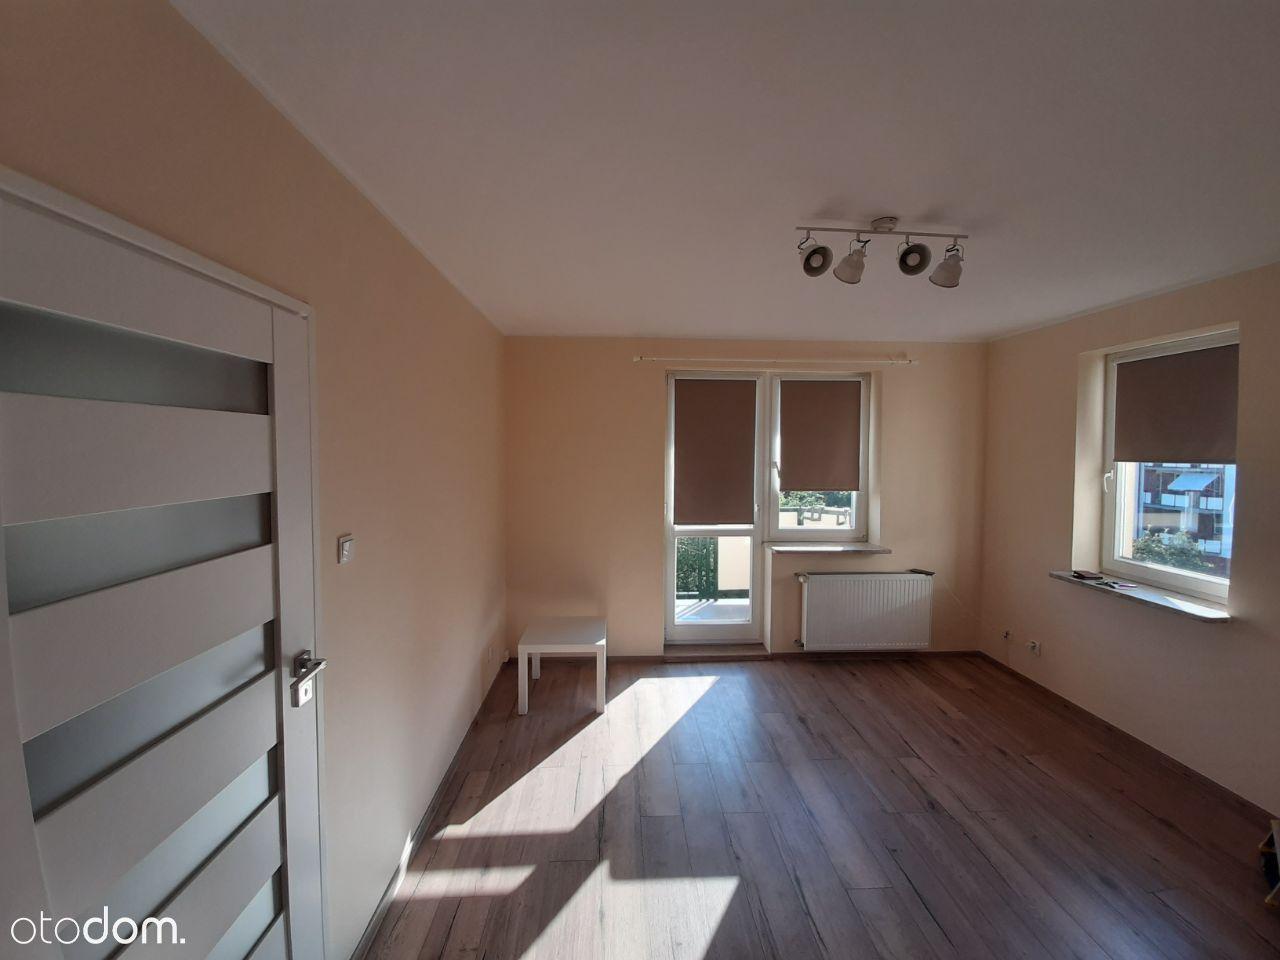 Retkinia, po remoncie, 2 piętro, 33 m2